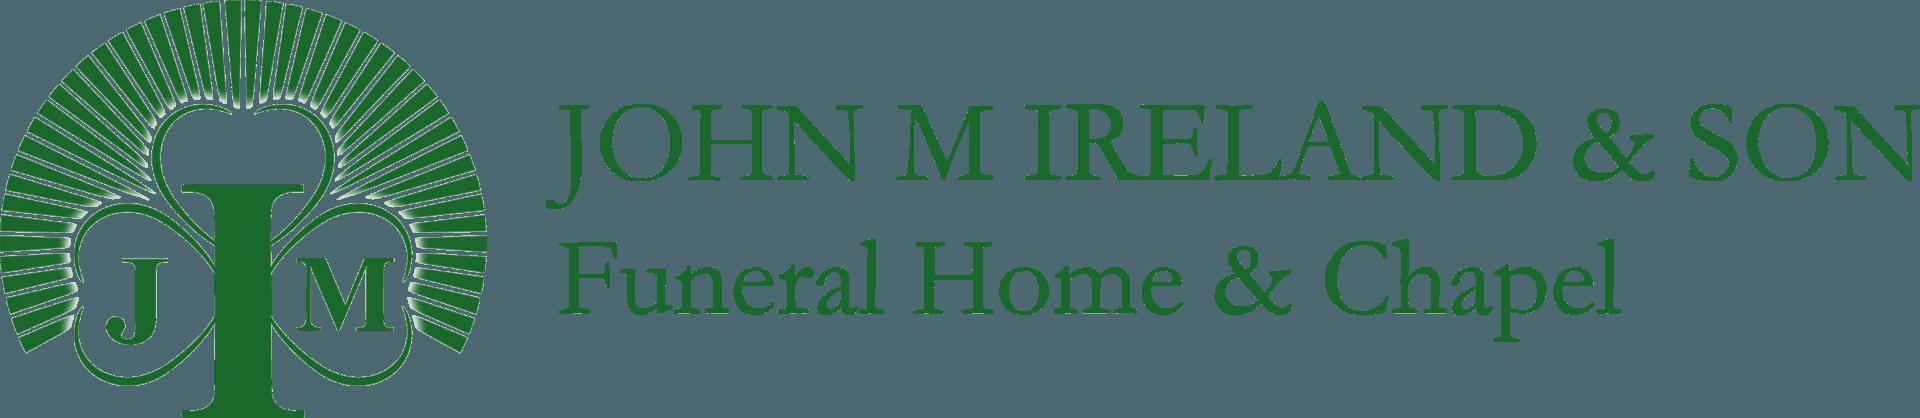 John M Ireland & Son Funeral Home & Chapel logo